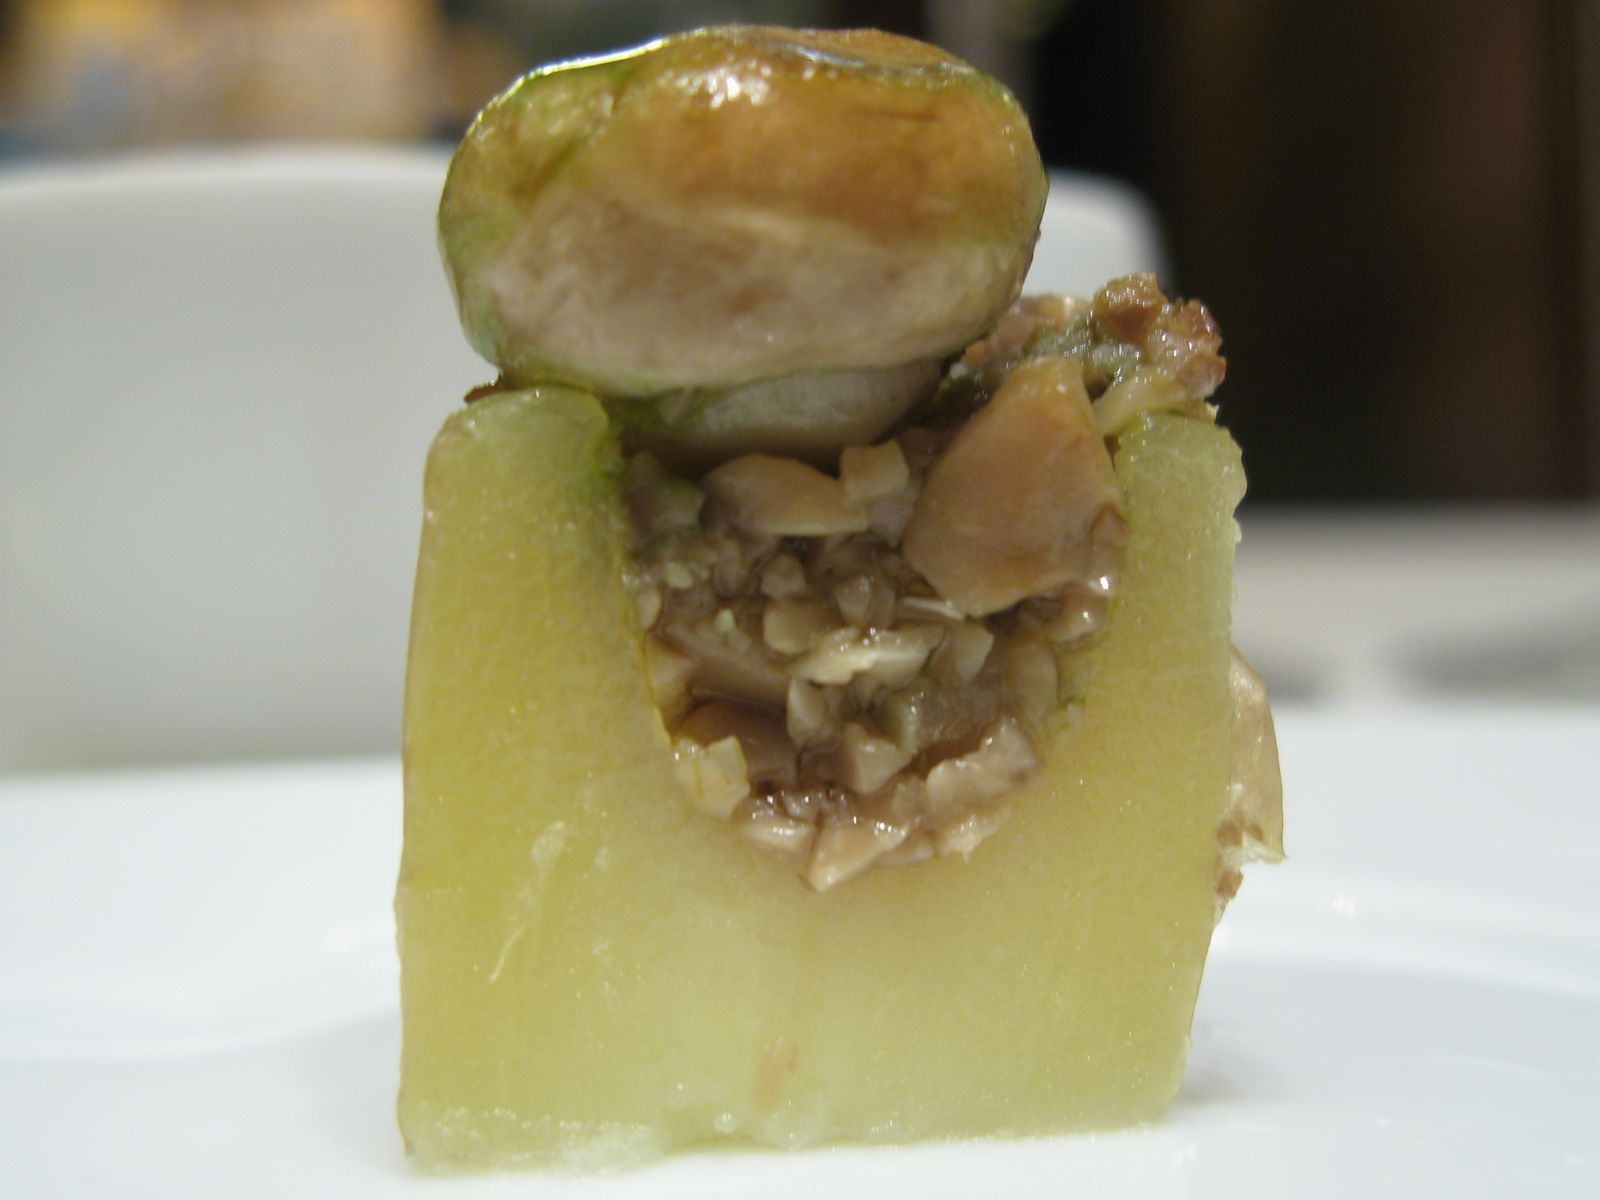 Amuse Bouche - Potato, Chanterelles, Caramelized Onion